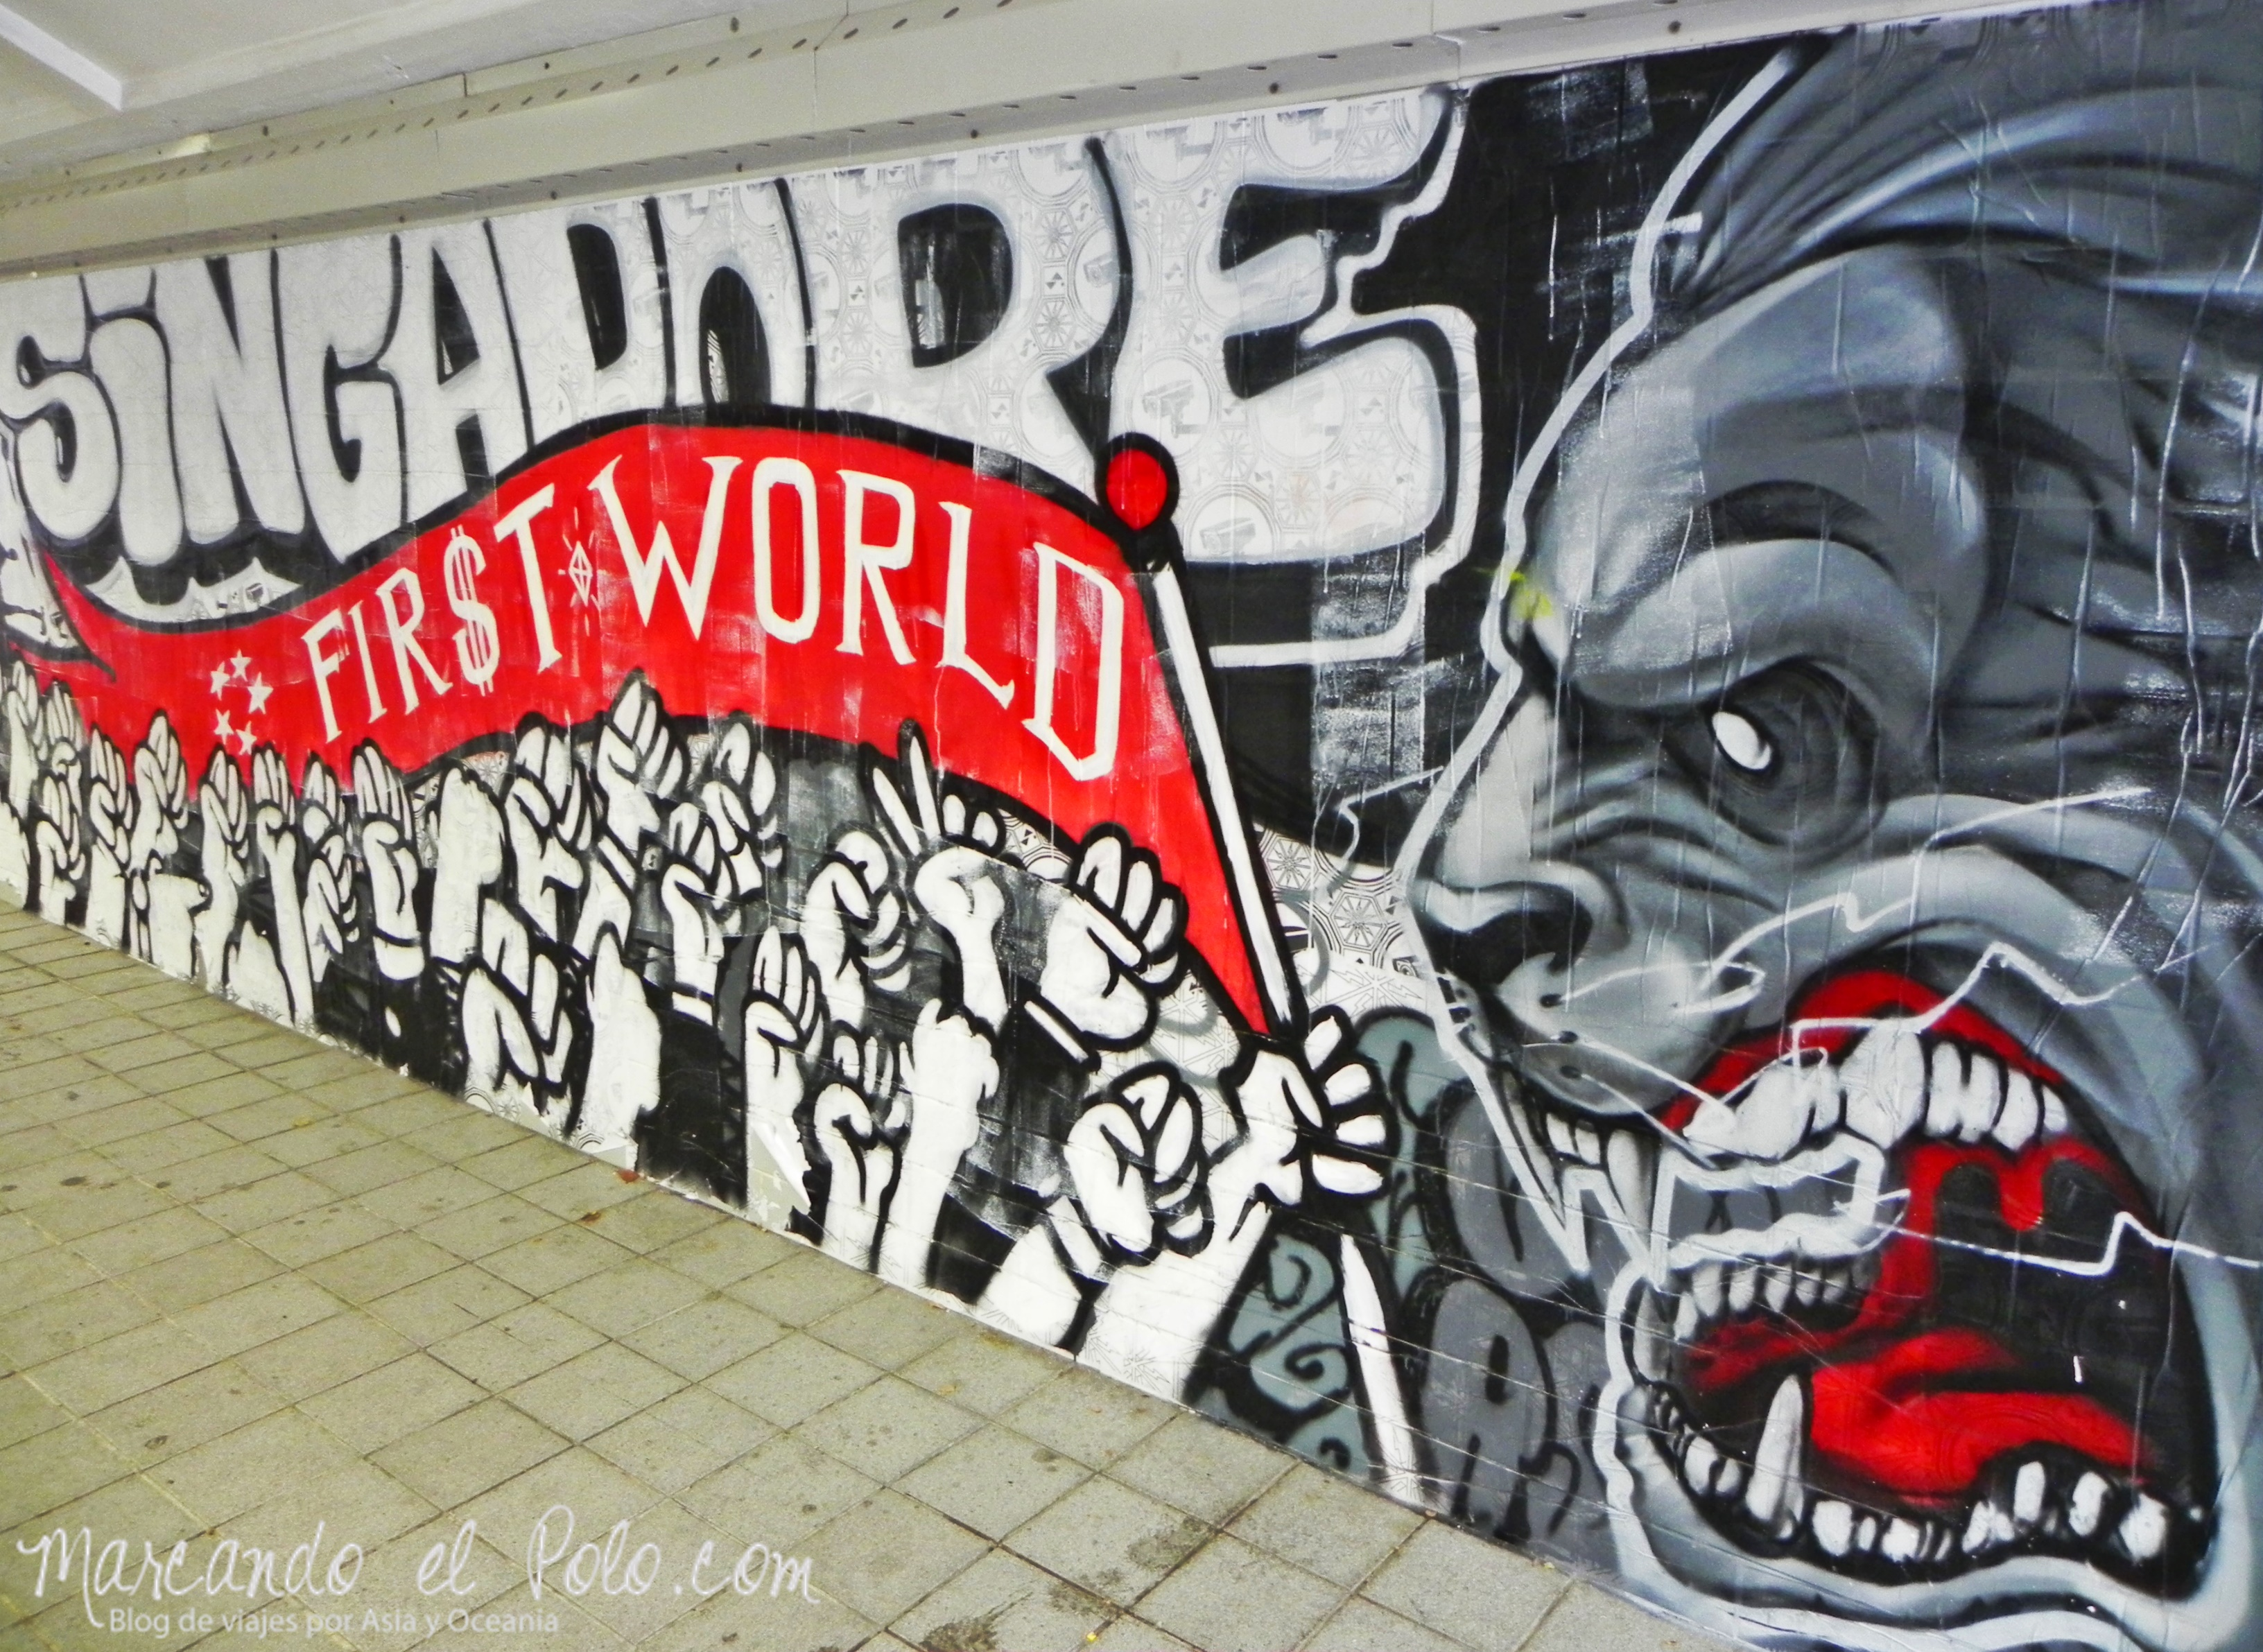 Singapore first world